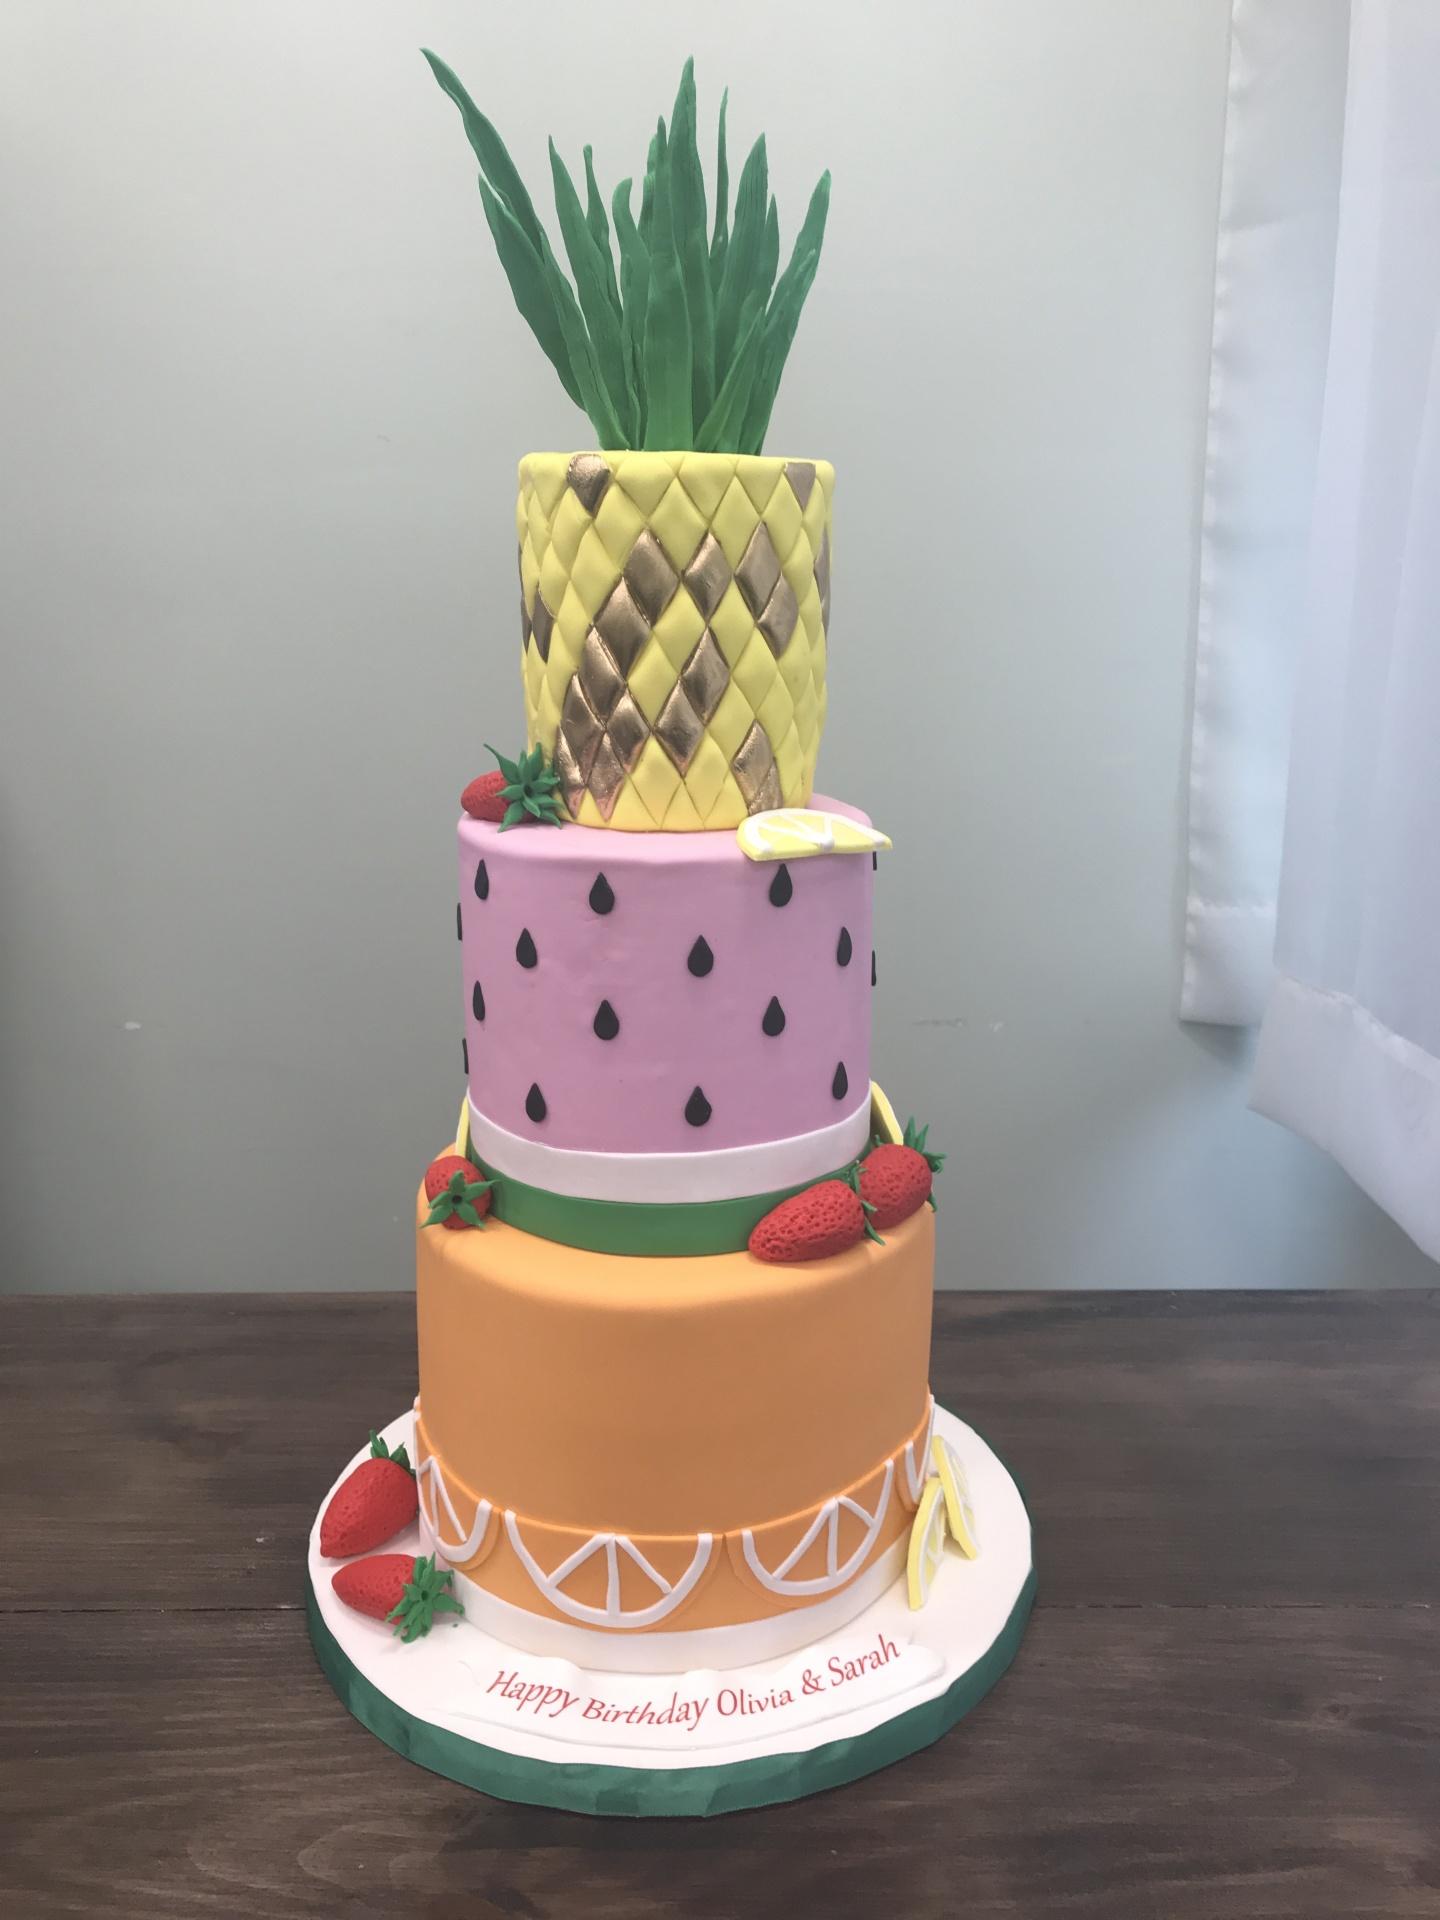 Summer Fruit Cake with Pineapple Custom Cakes NJ